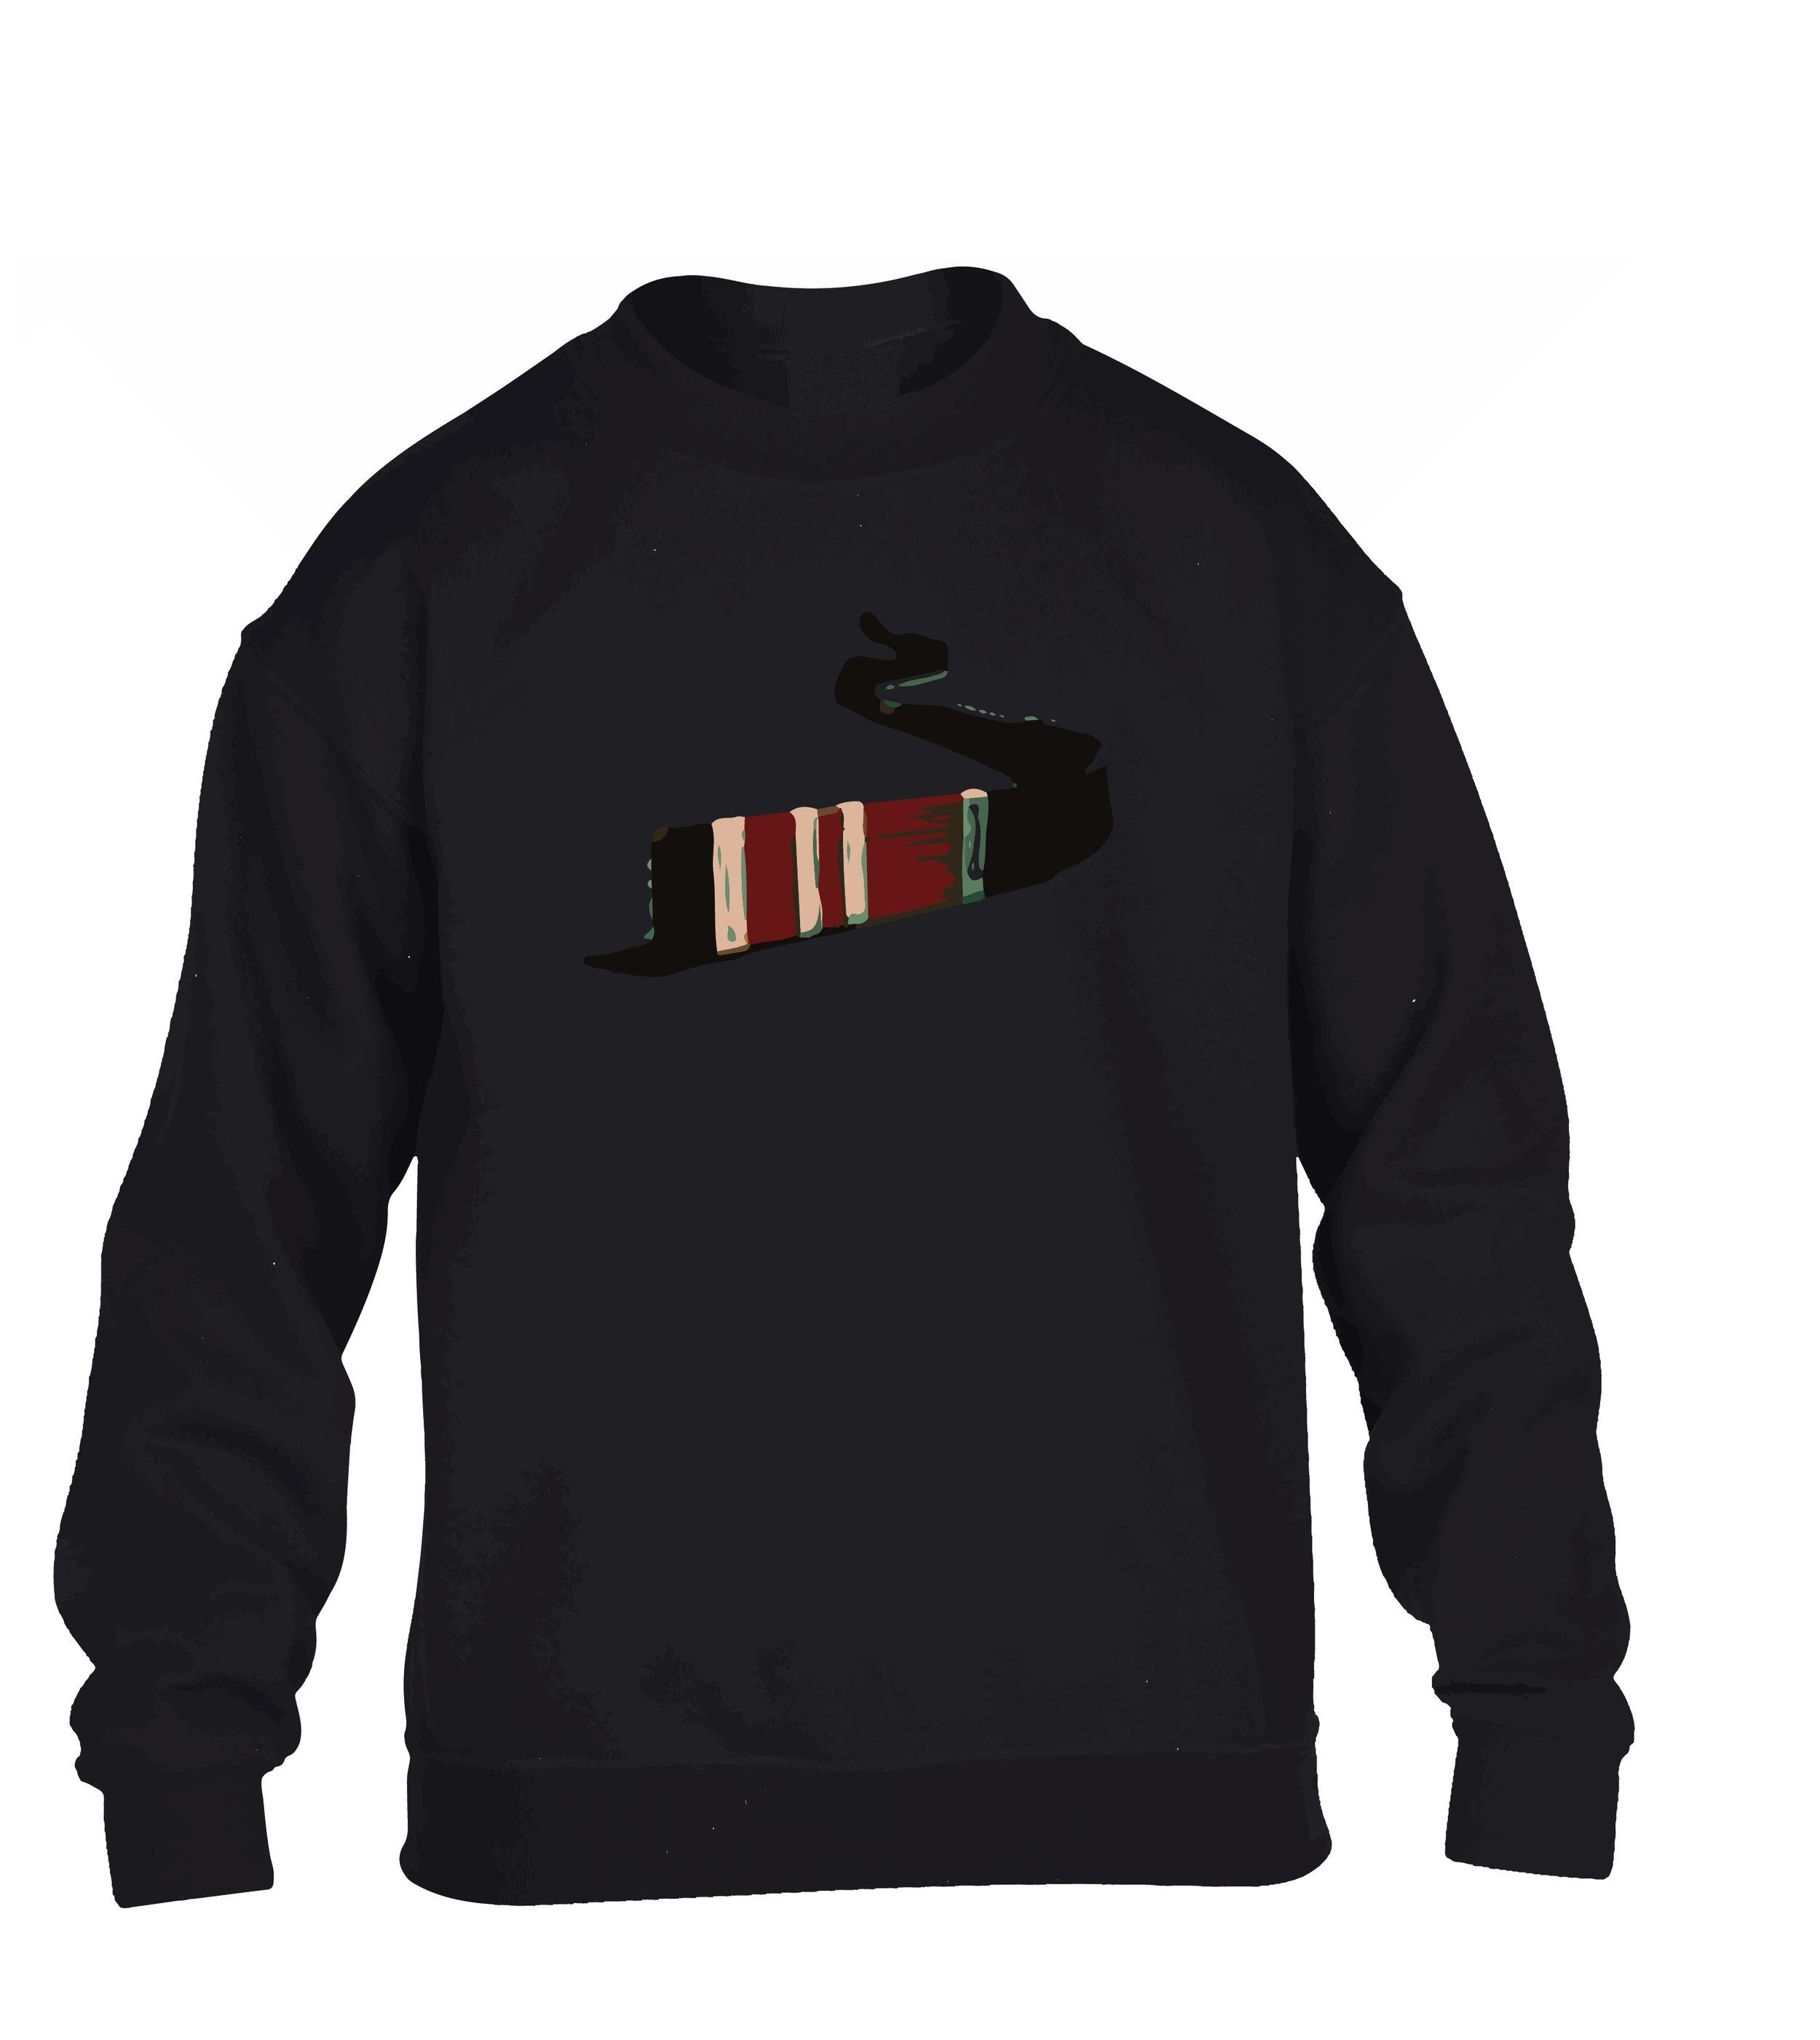 Black Jiu Jitsu jumper